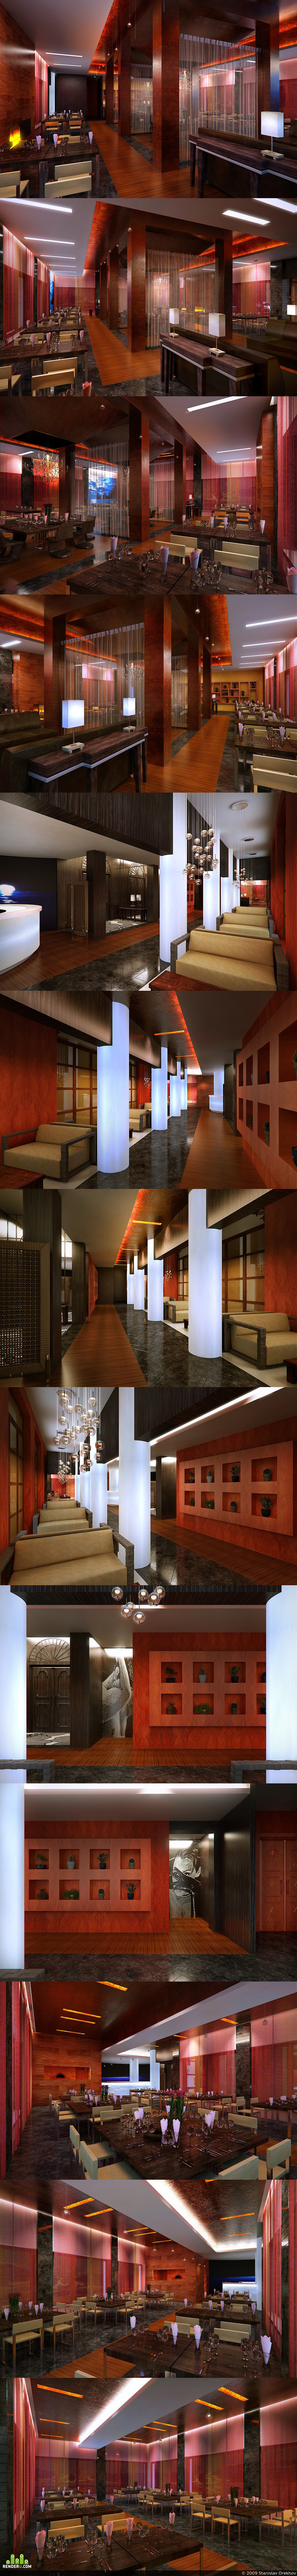 preview Ресторан в Доха, Катар